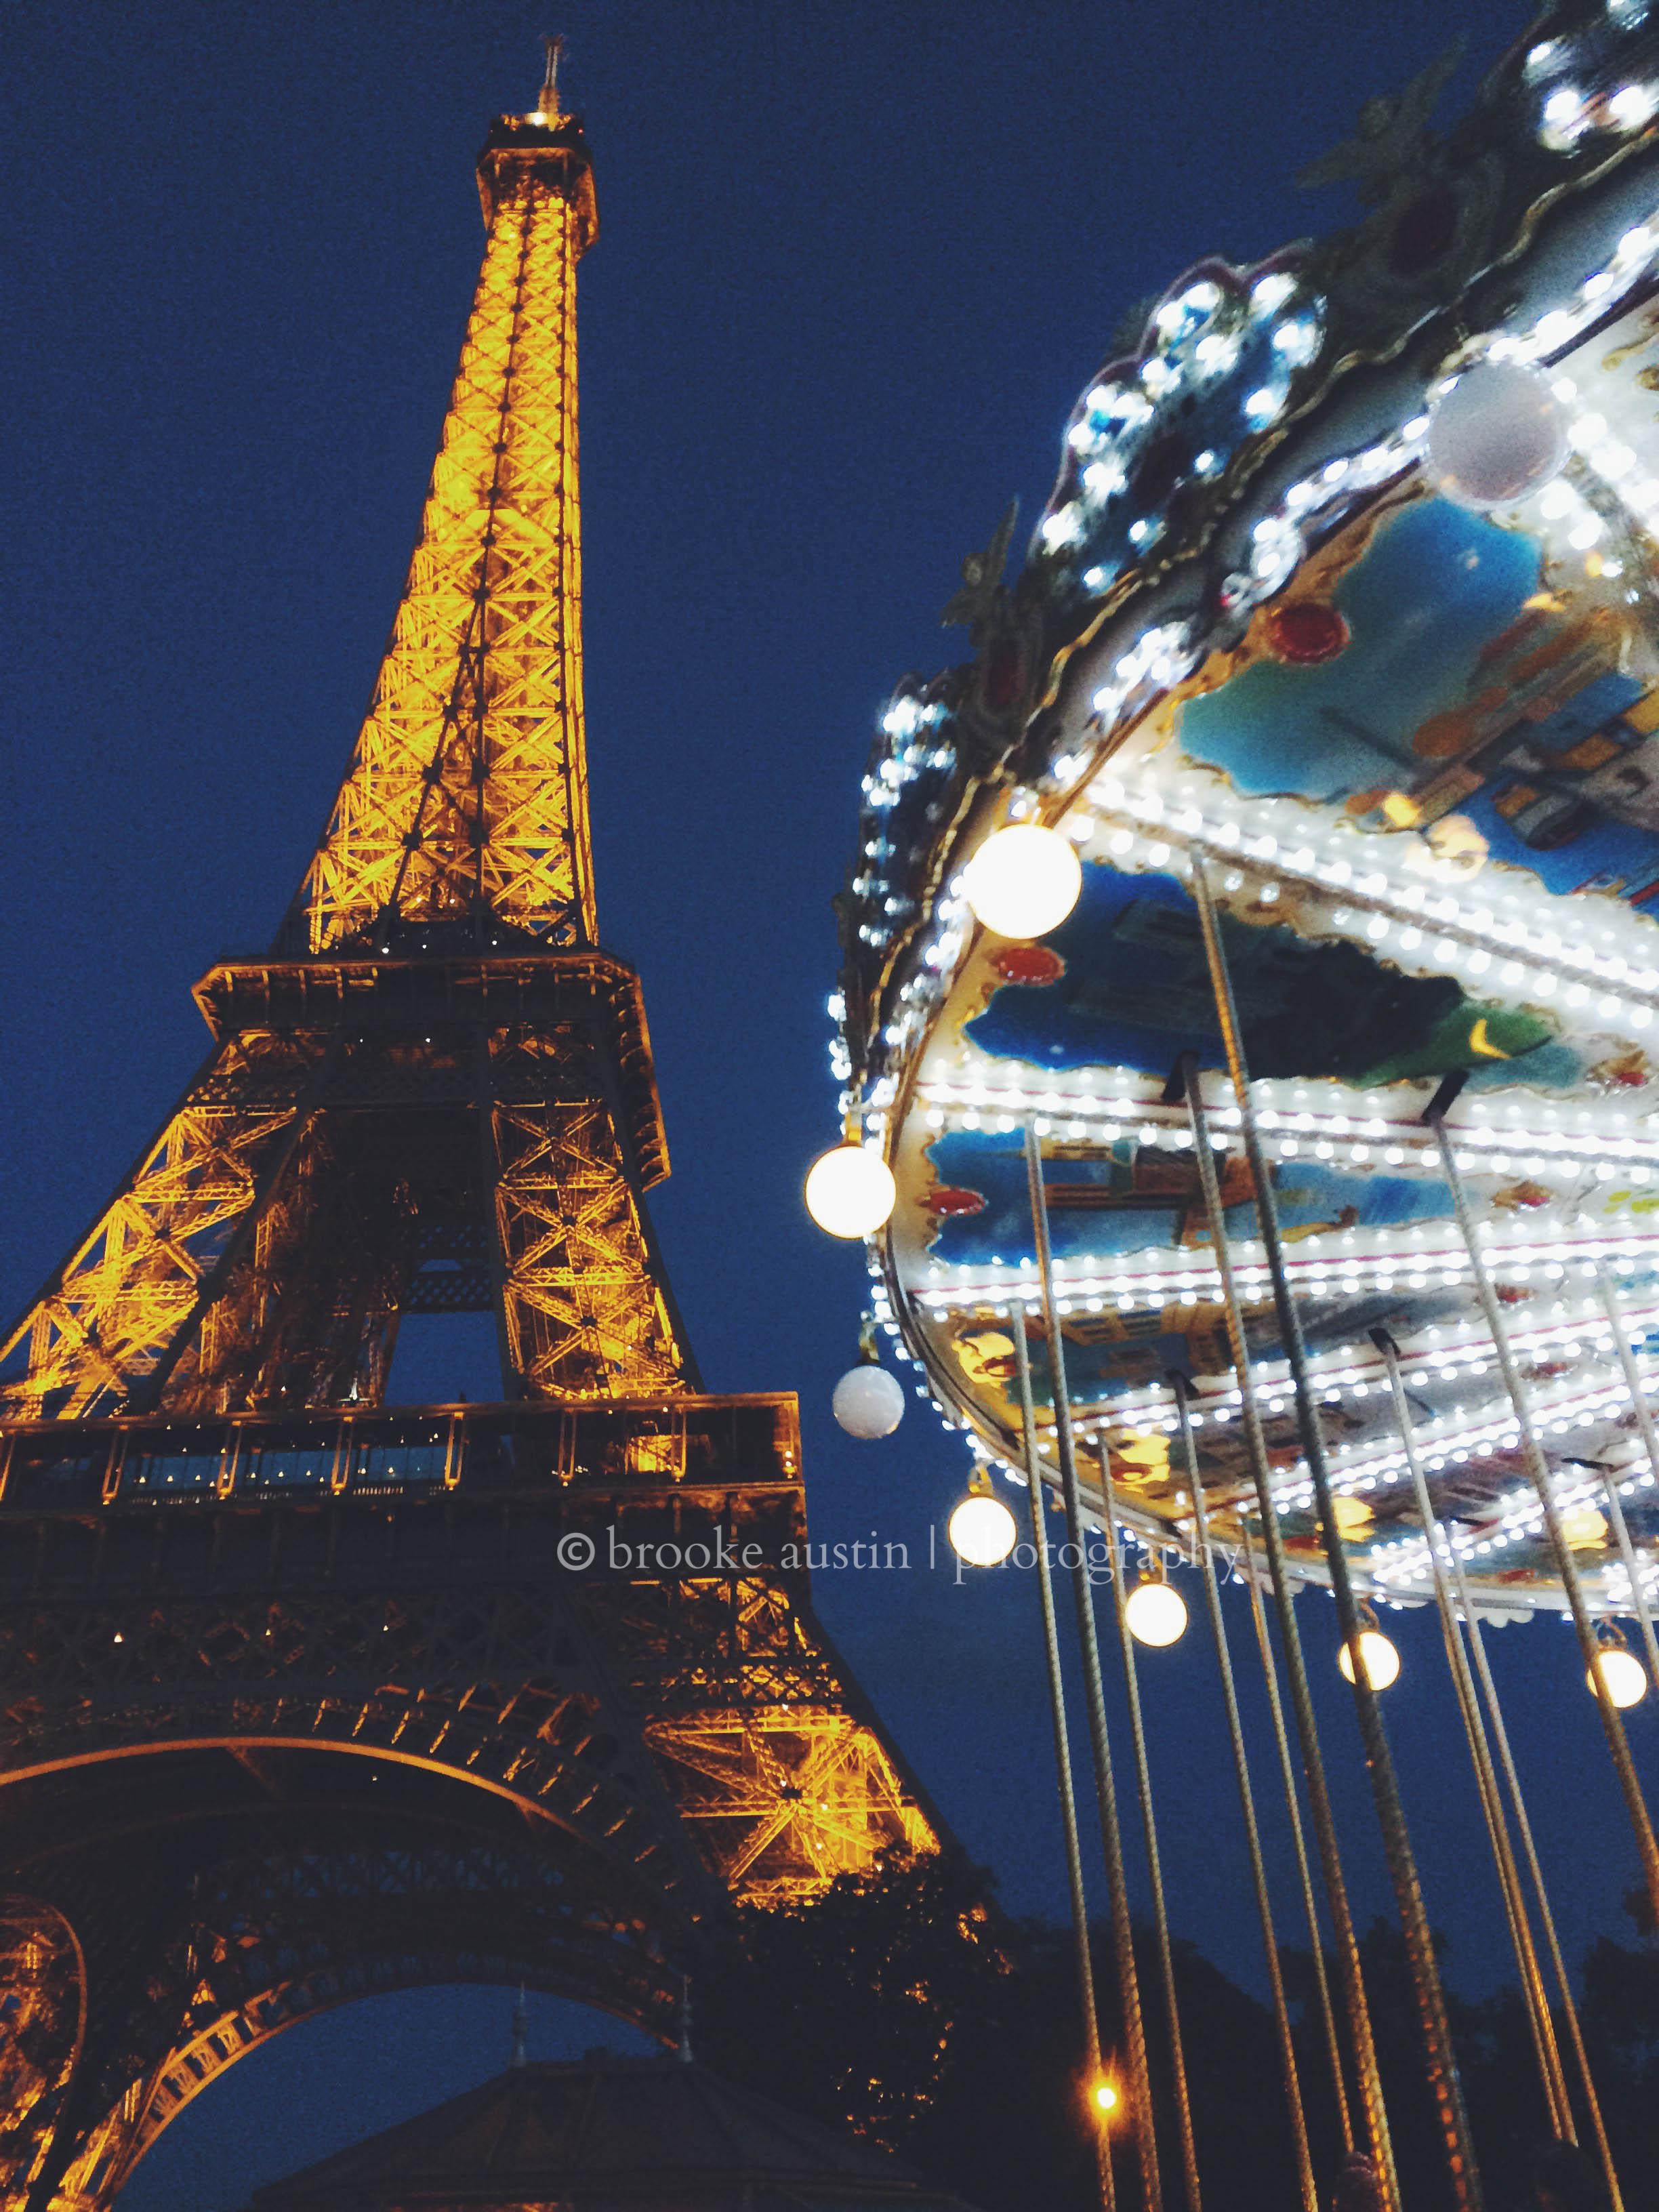 Eiffel Tower In Paris Nighttime With Carousel Digital Download File Brooke Austin Photo